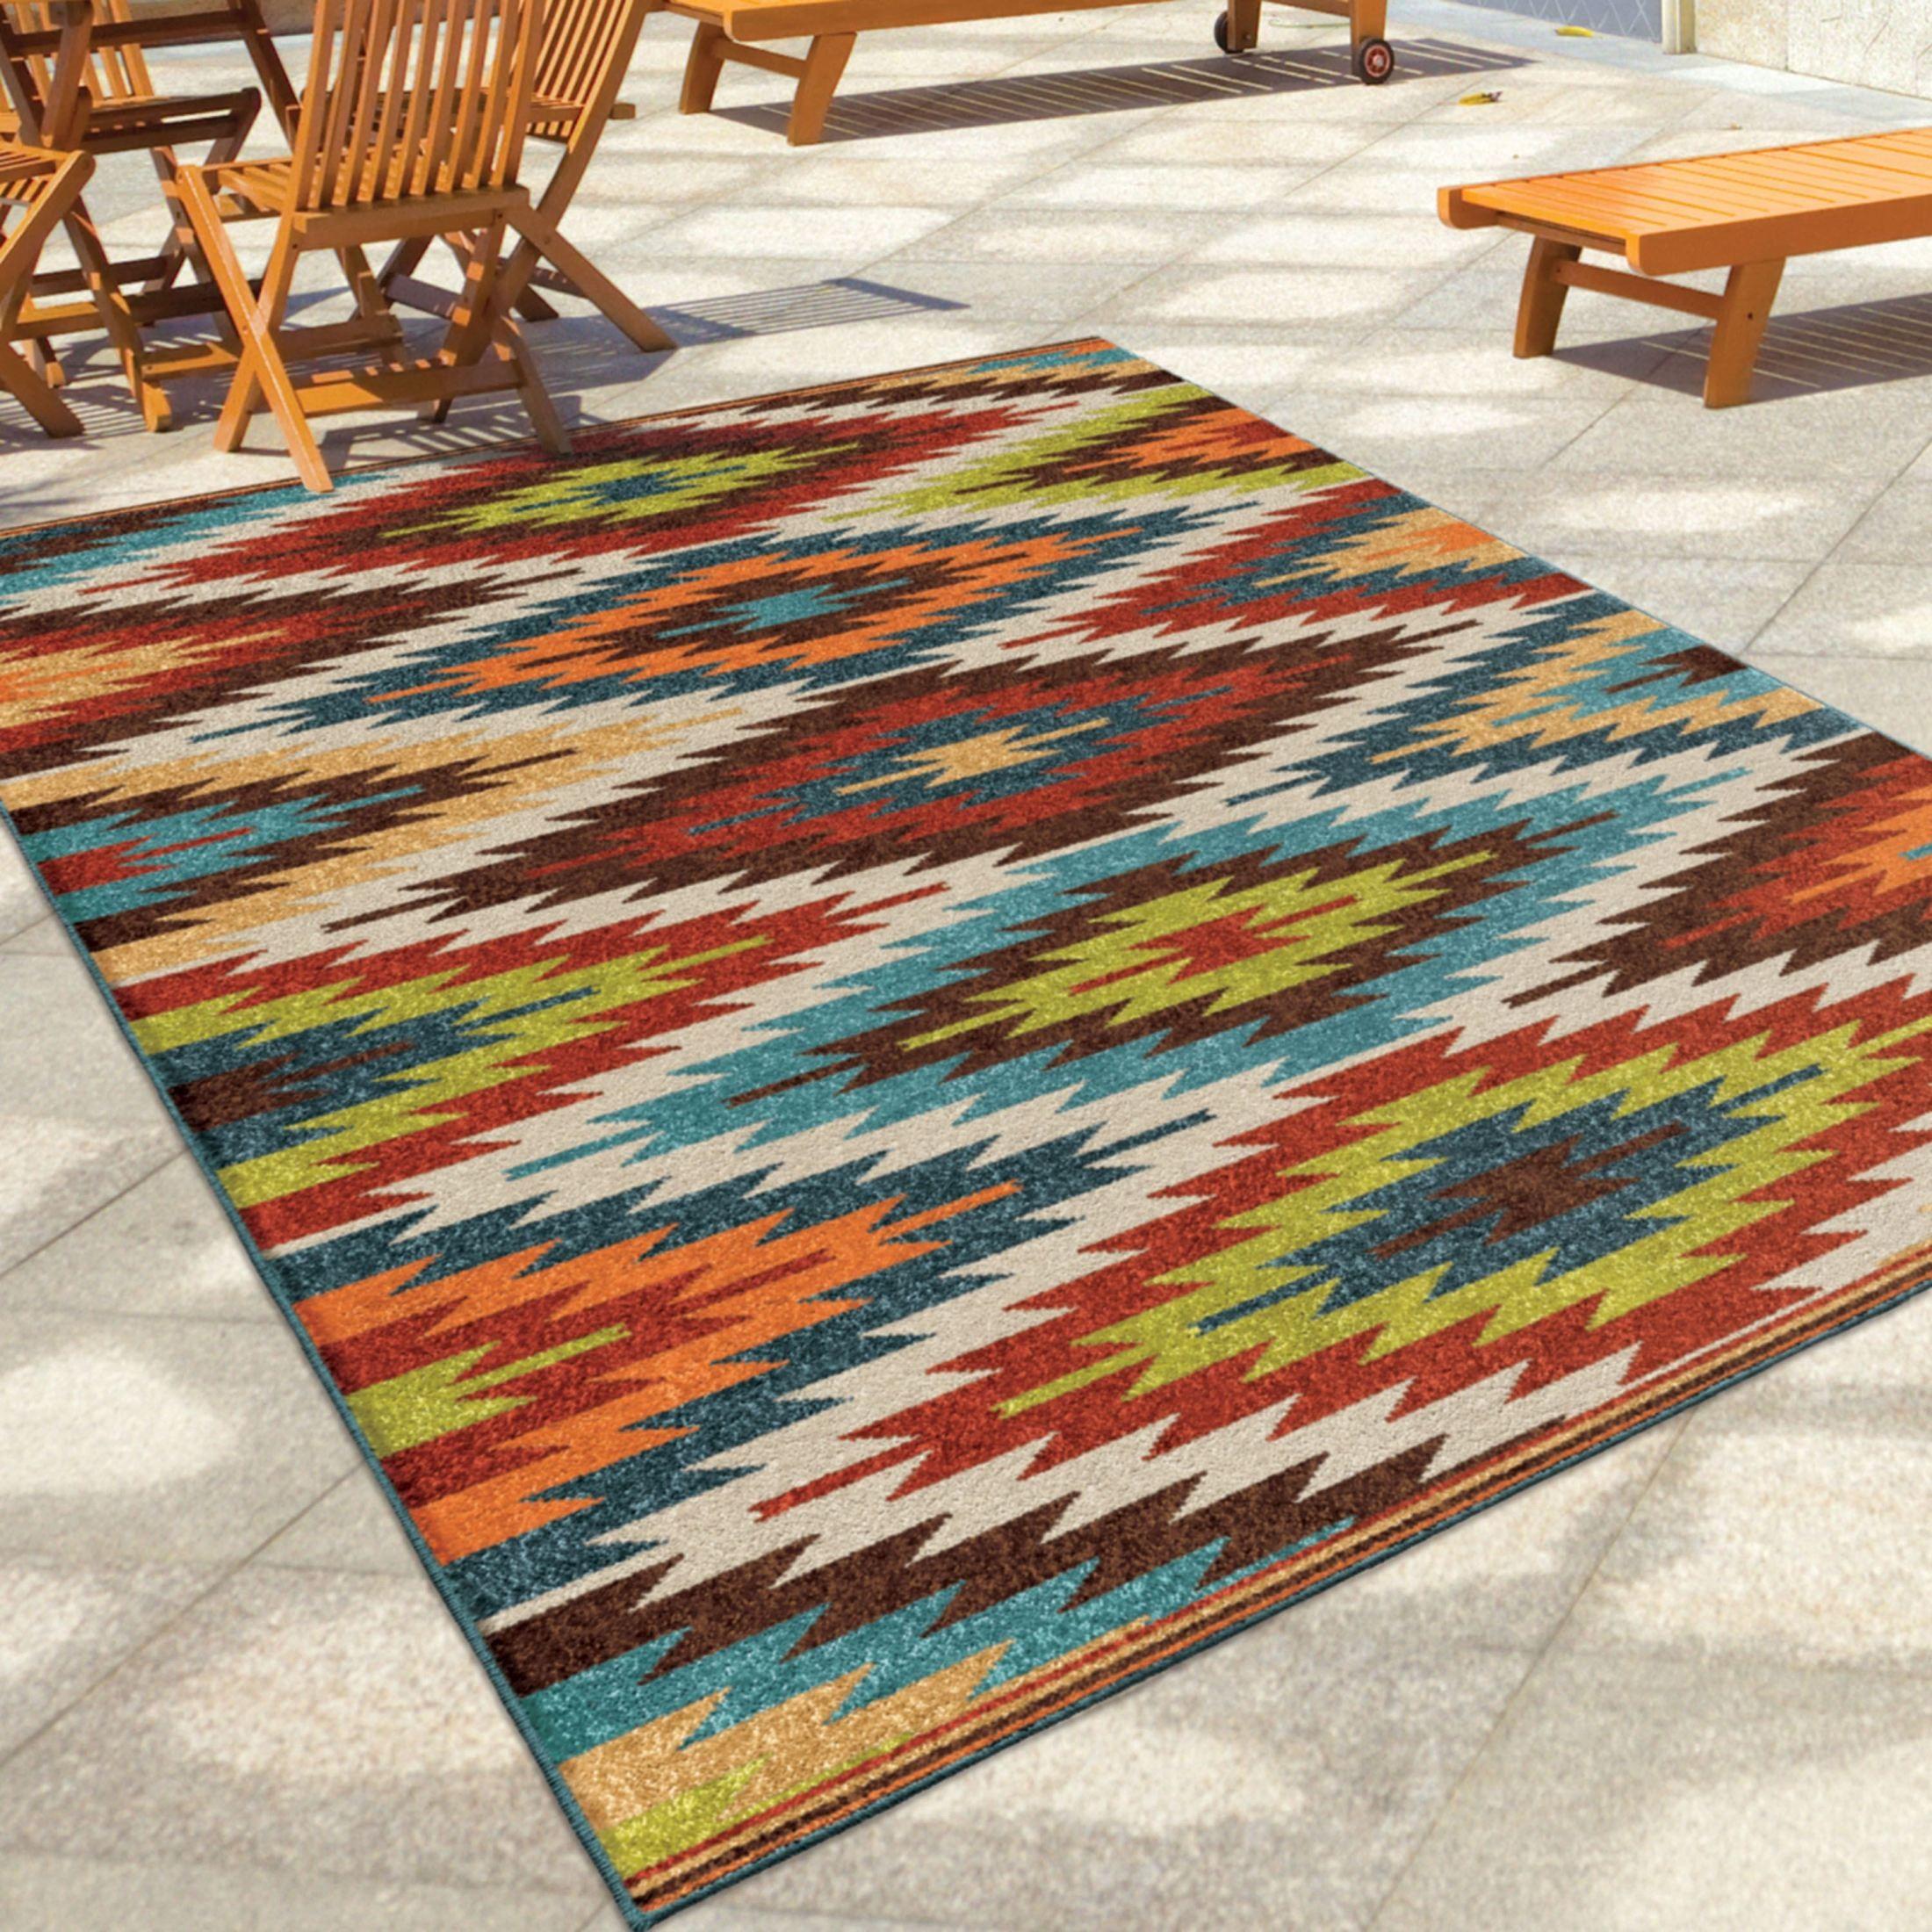 Outdoor 5x8 Area Rug: Orian Rugs Indoor/Outdoor Aztec Sedona Multi Area Small